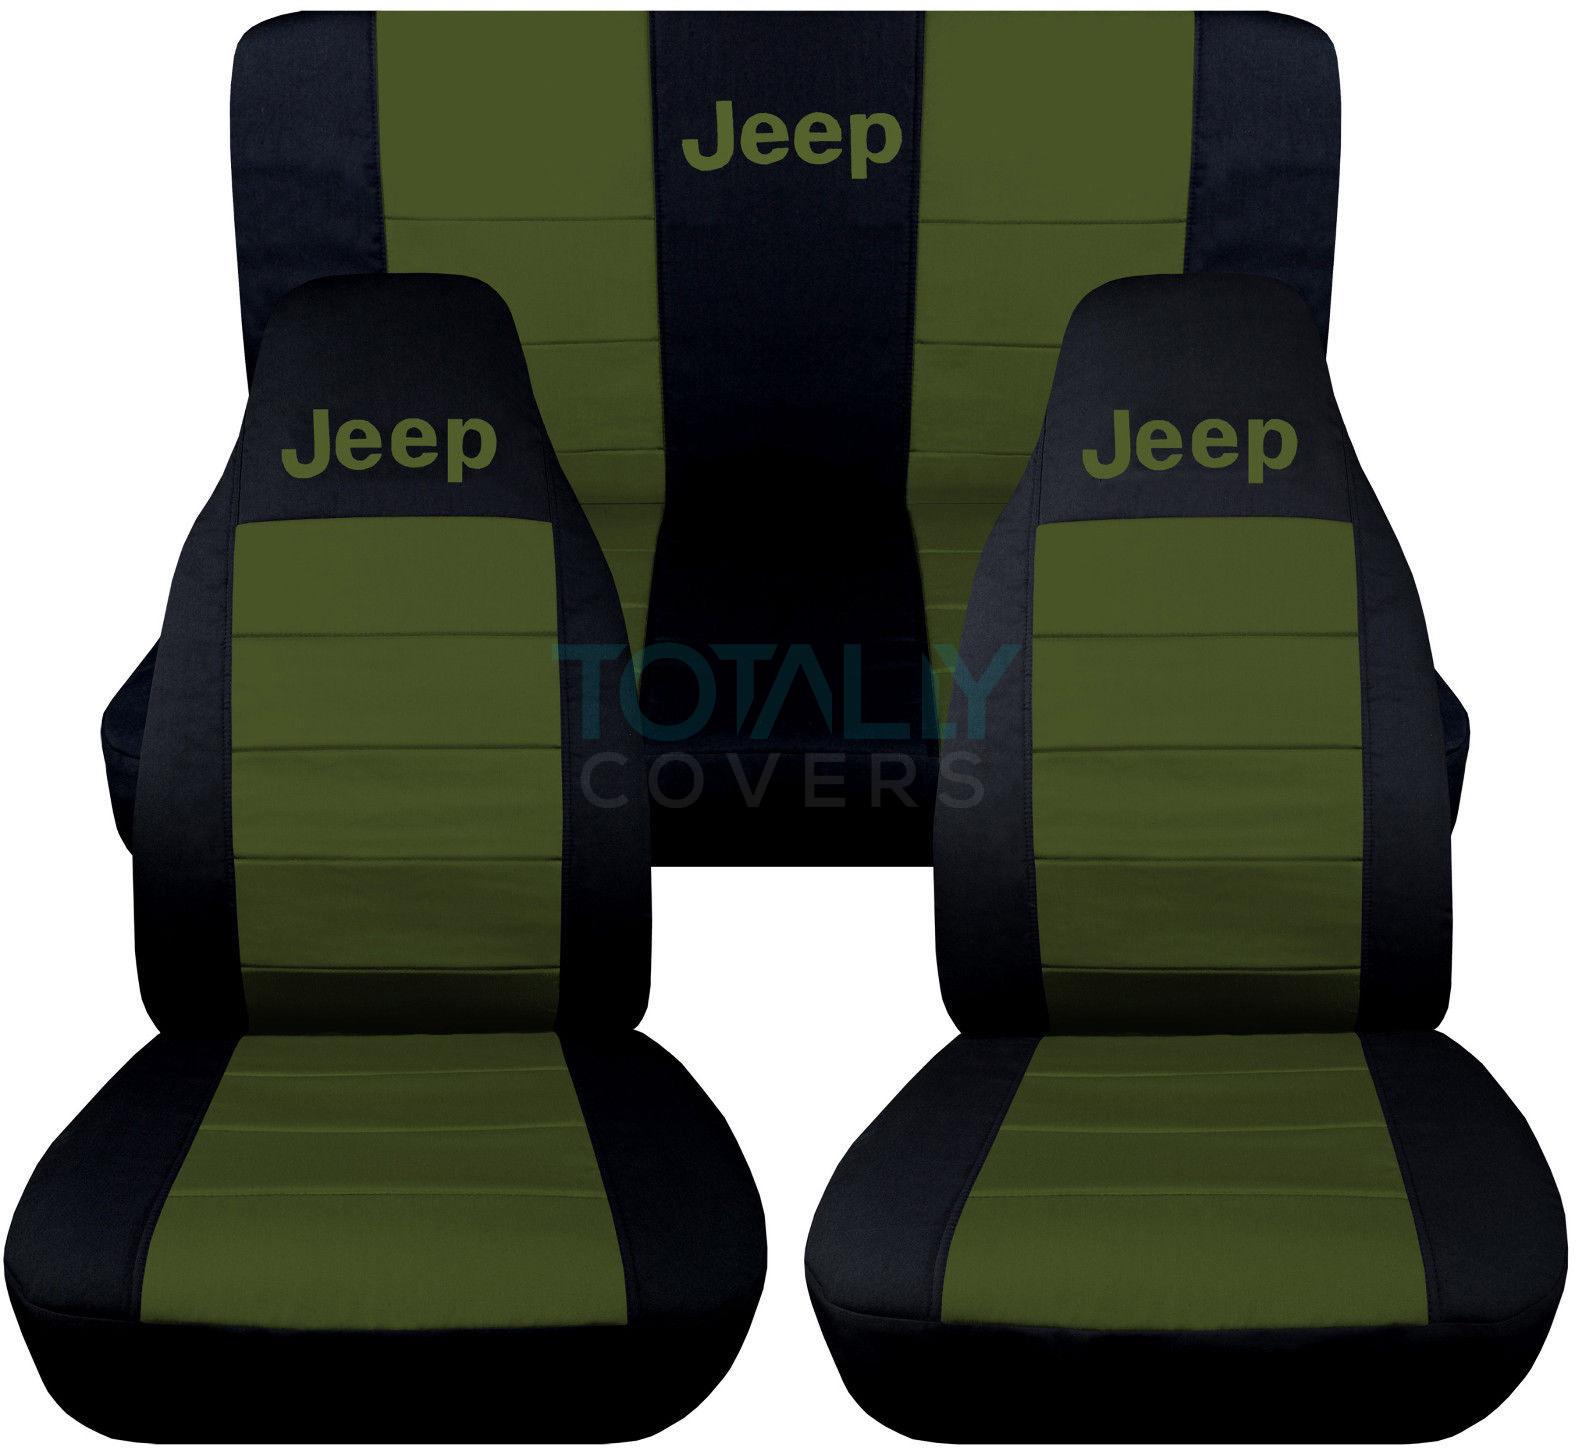 jeep wrangler yj tj jk 1987 2017 2 tone seat covers w logo front rear full set ebay. Black Bedroom Furniture Sets. Home Design Ideas